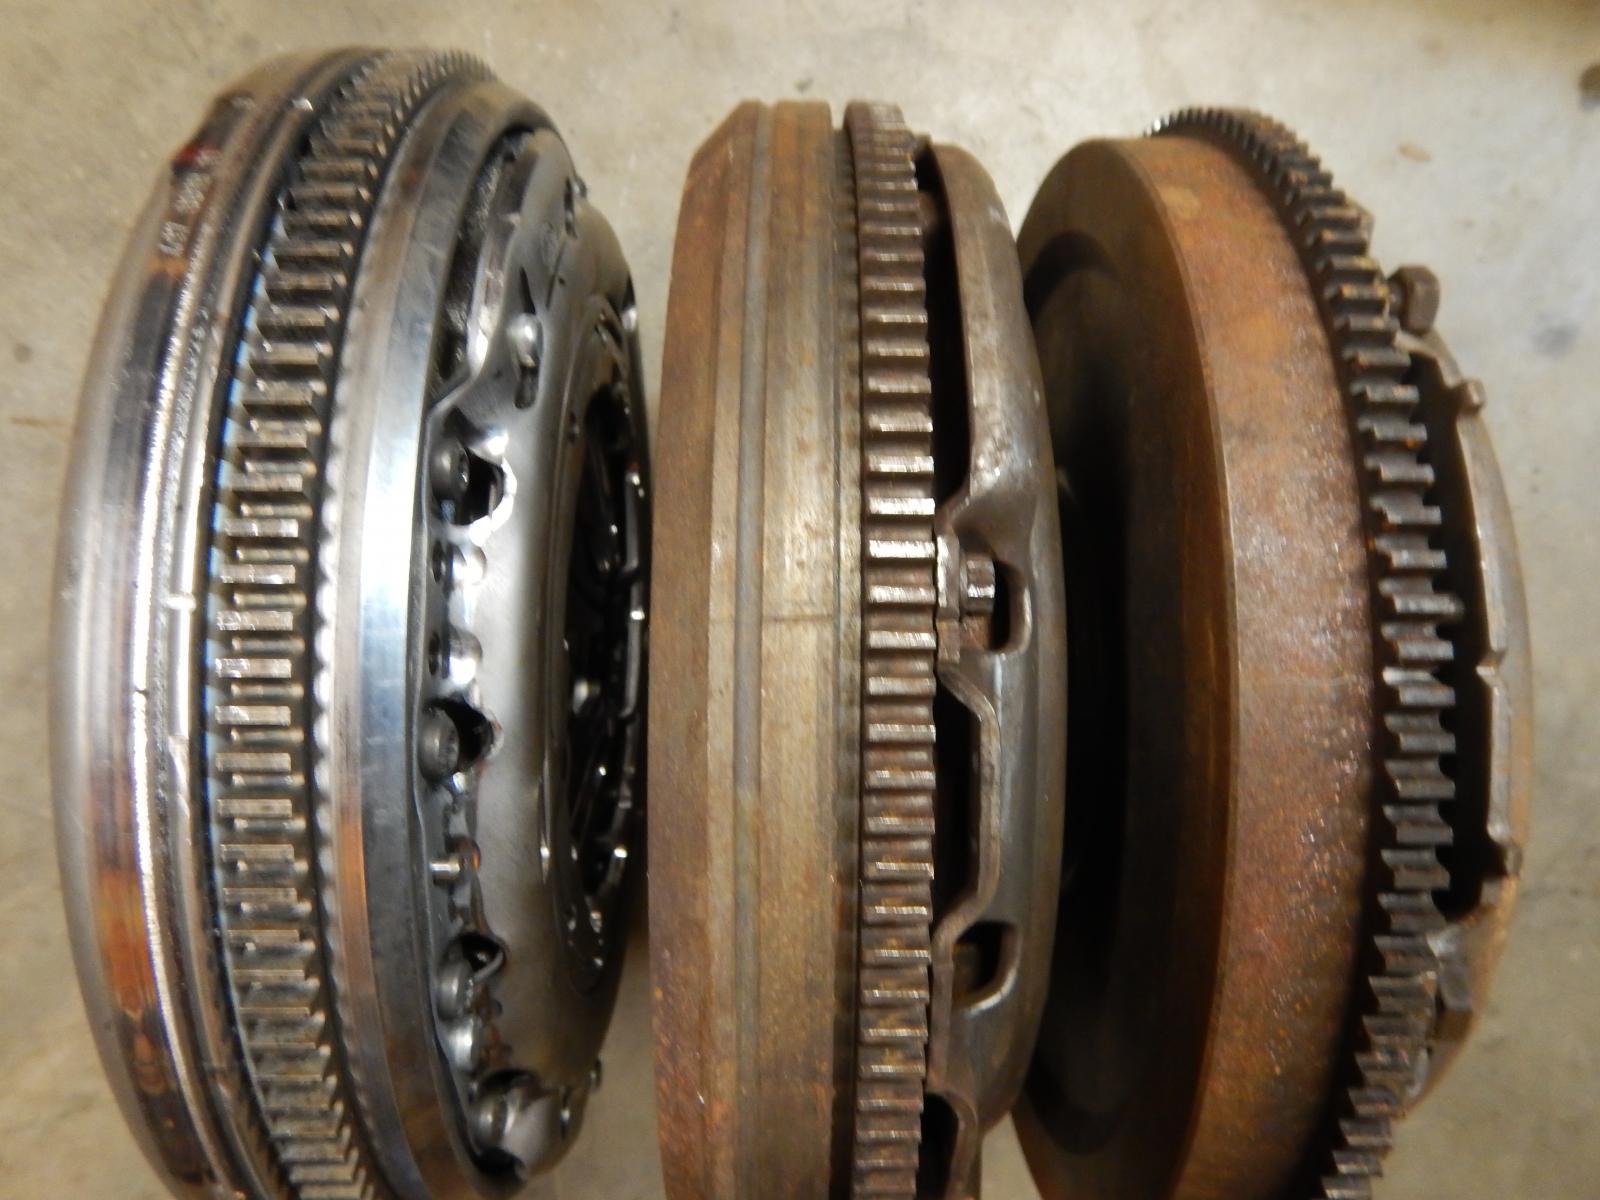 Vanagon Flywheels